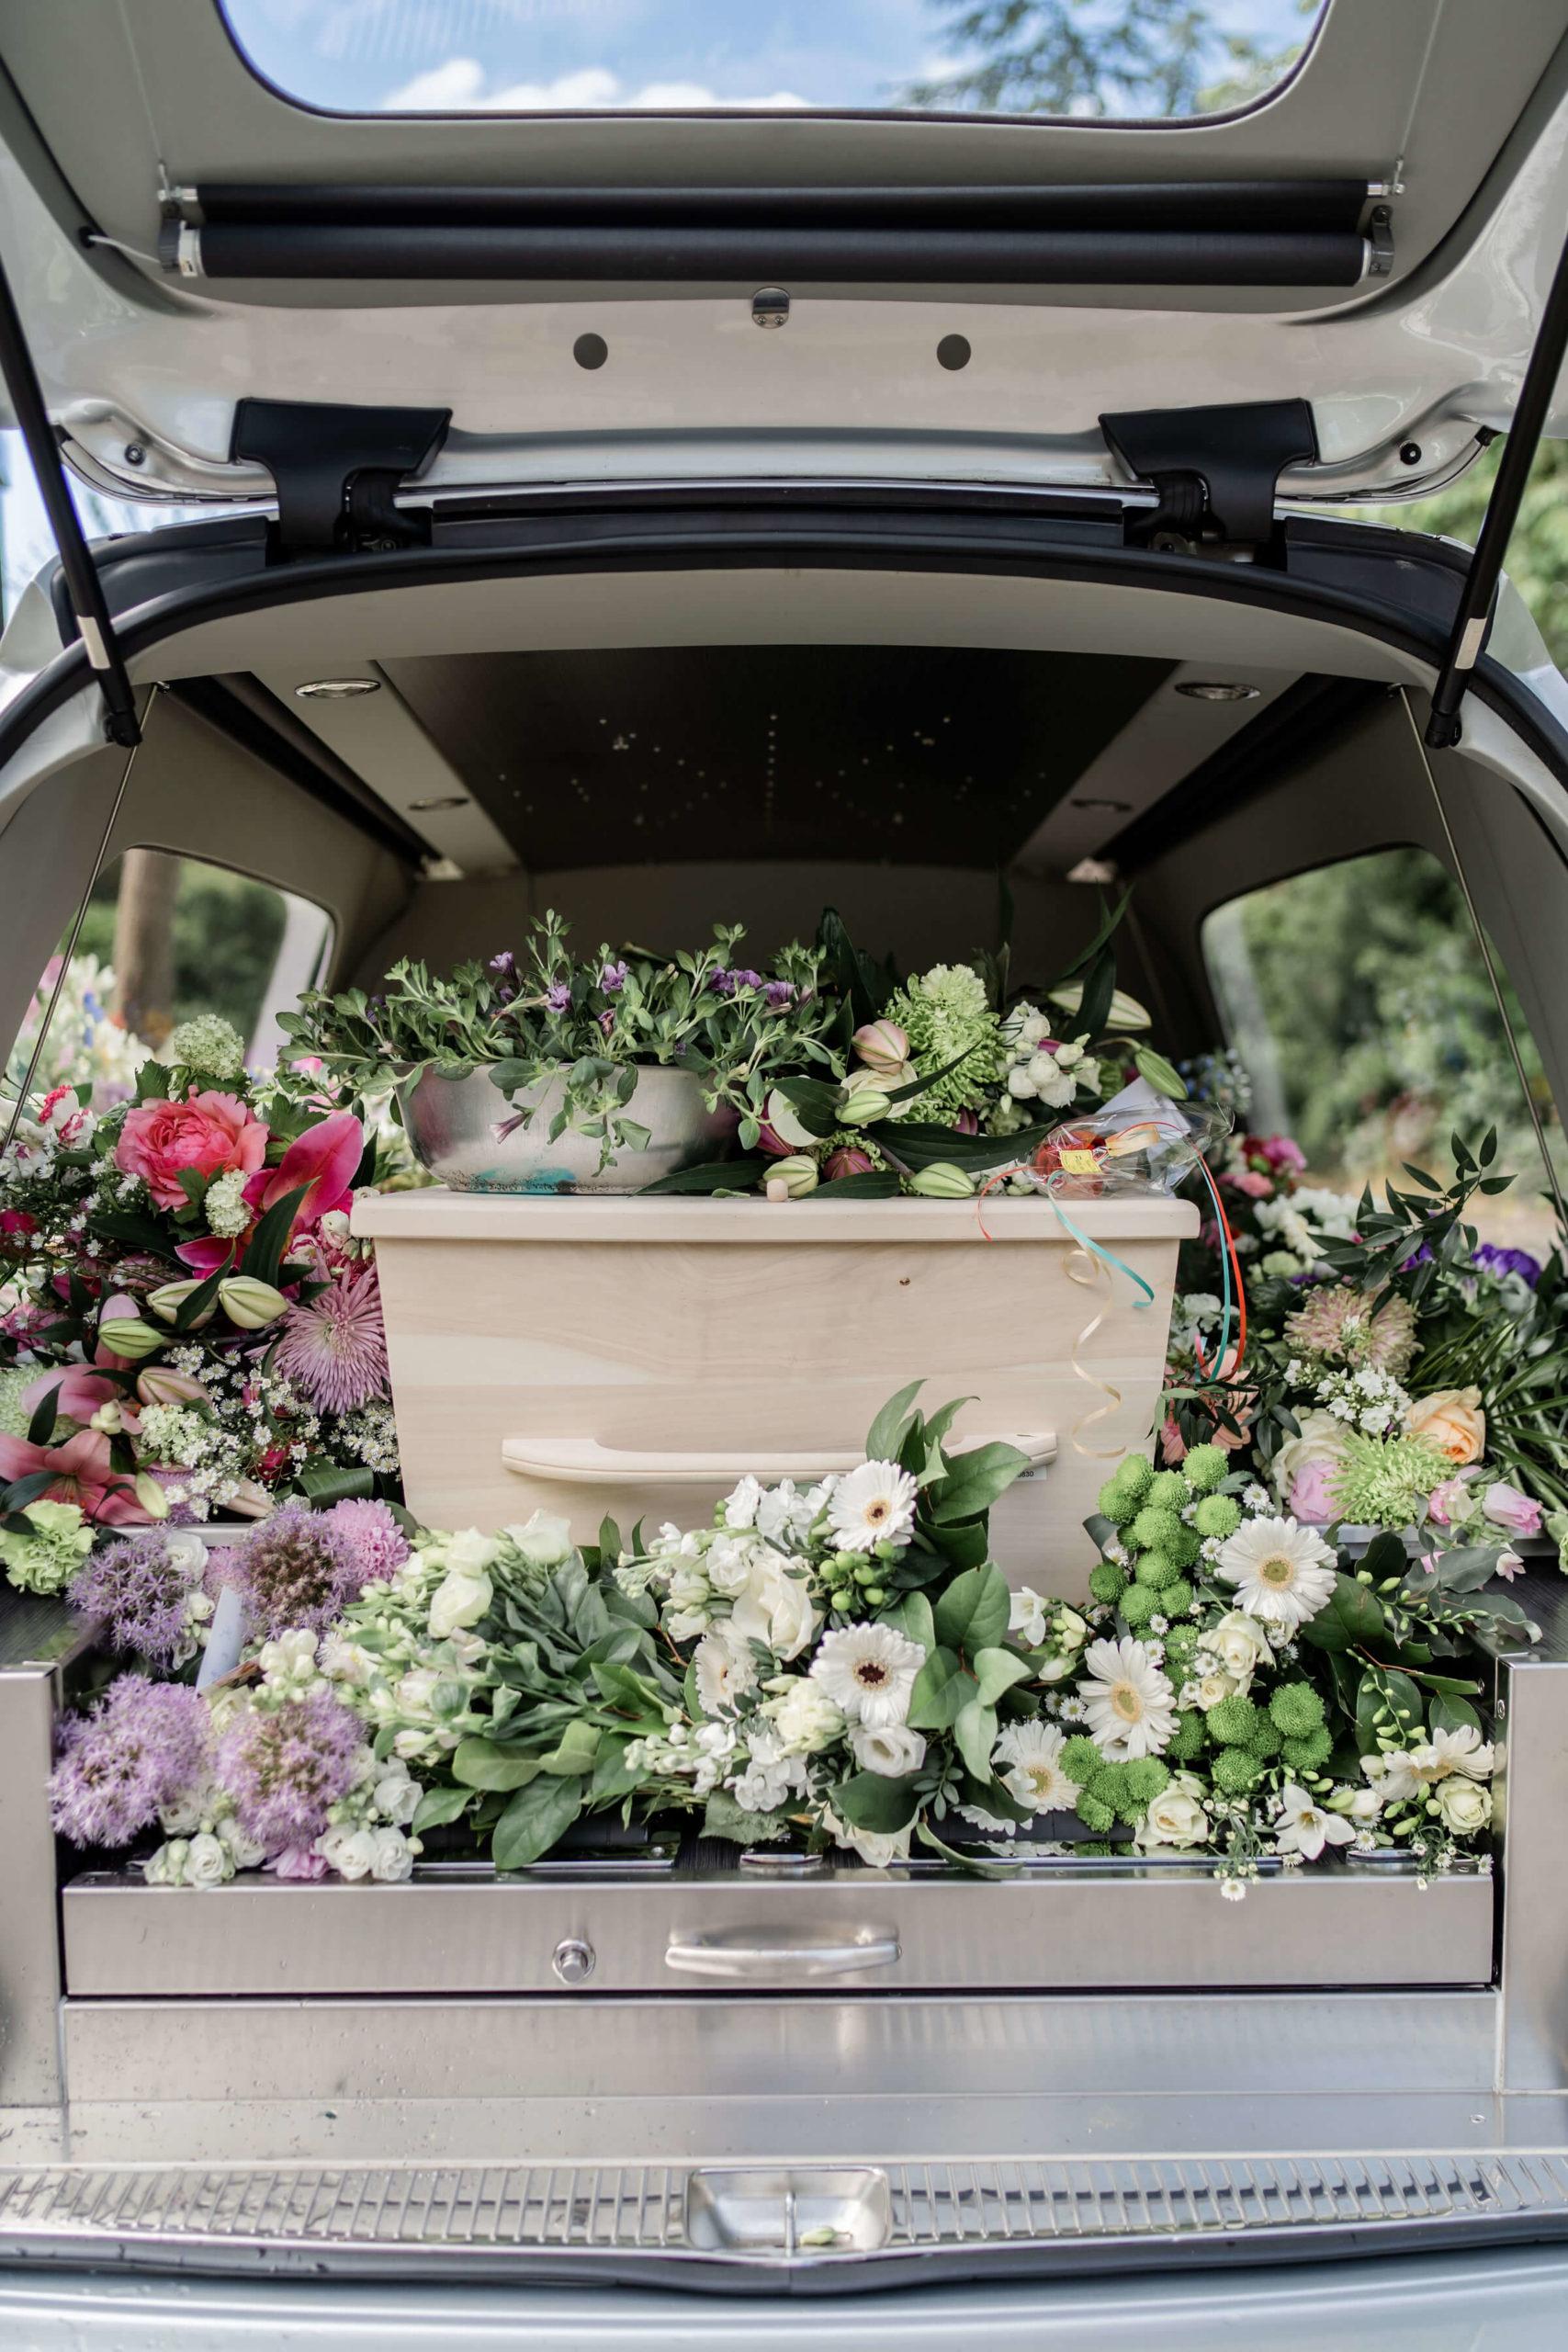 rouwwagen-bloemen-kist-afscheid